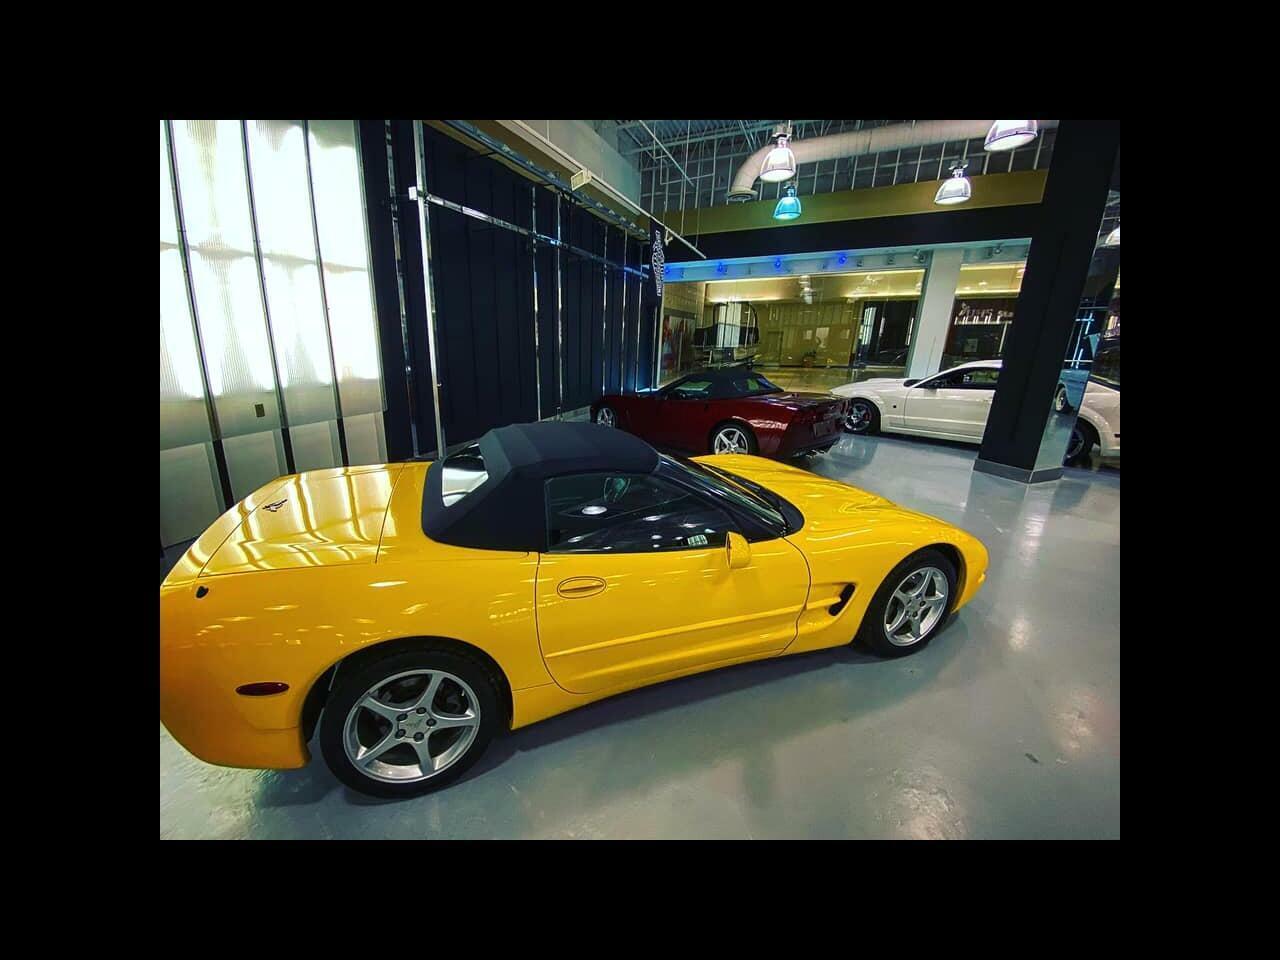 2002 Yellow Chevrolet Corvette Convertible    C5 Corvette Photo 3